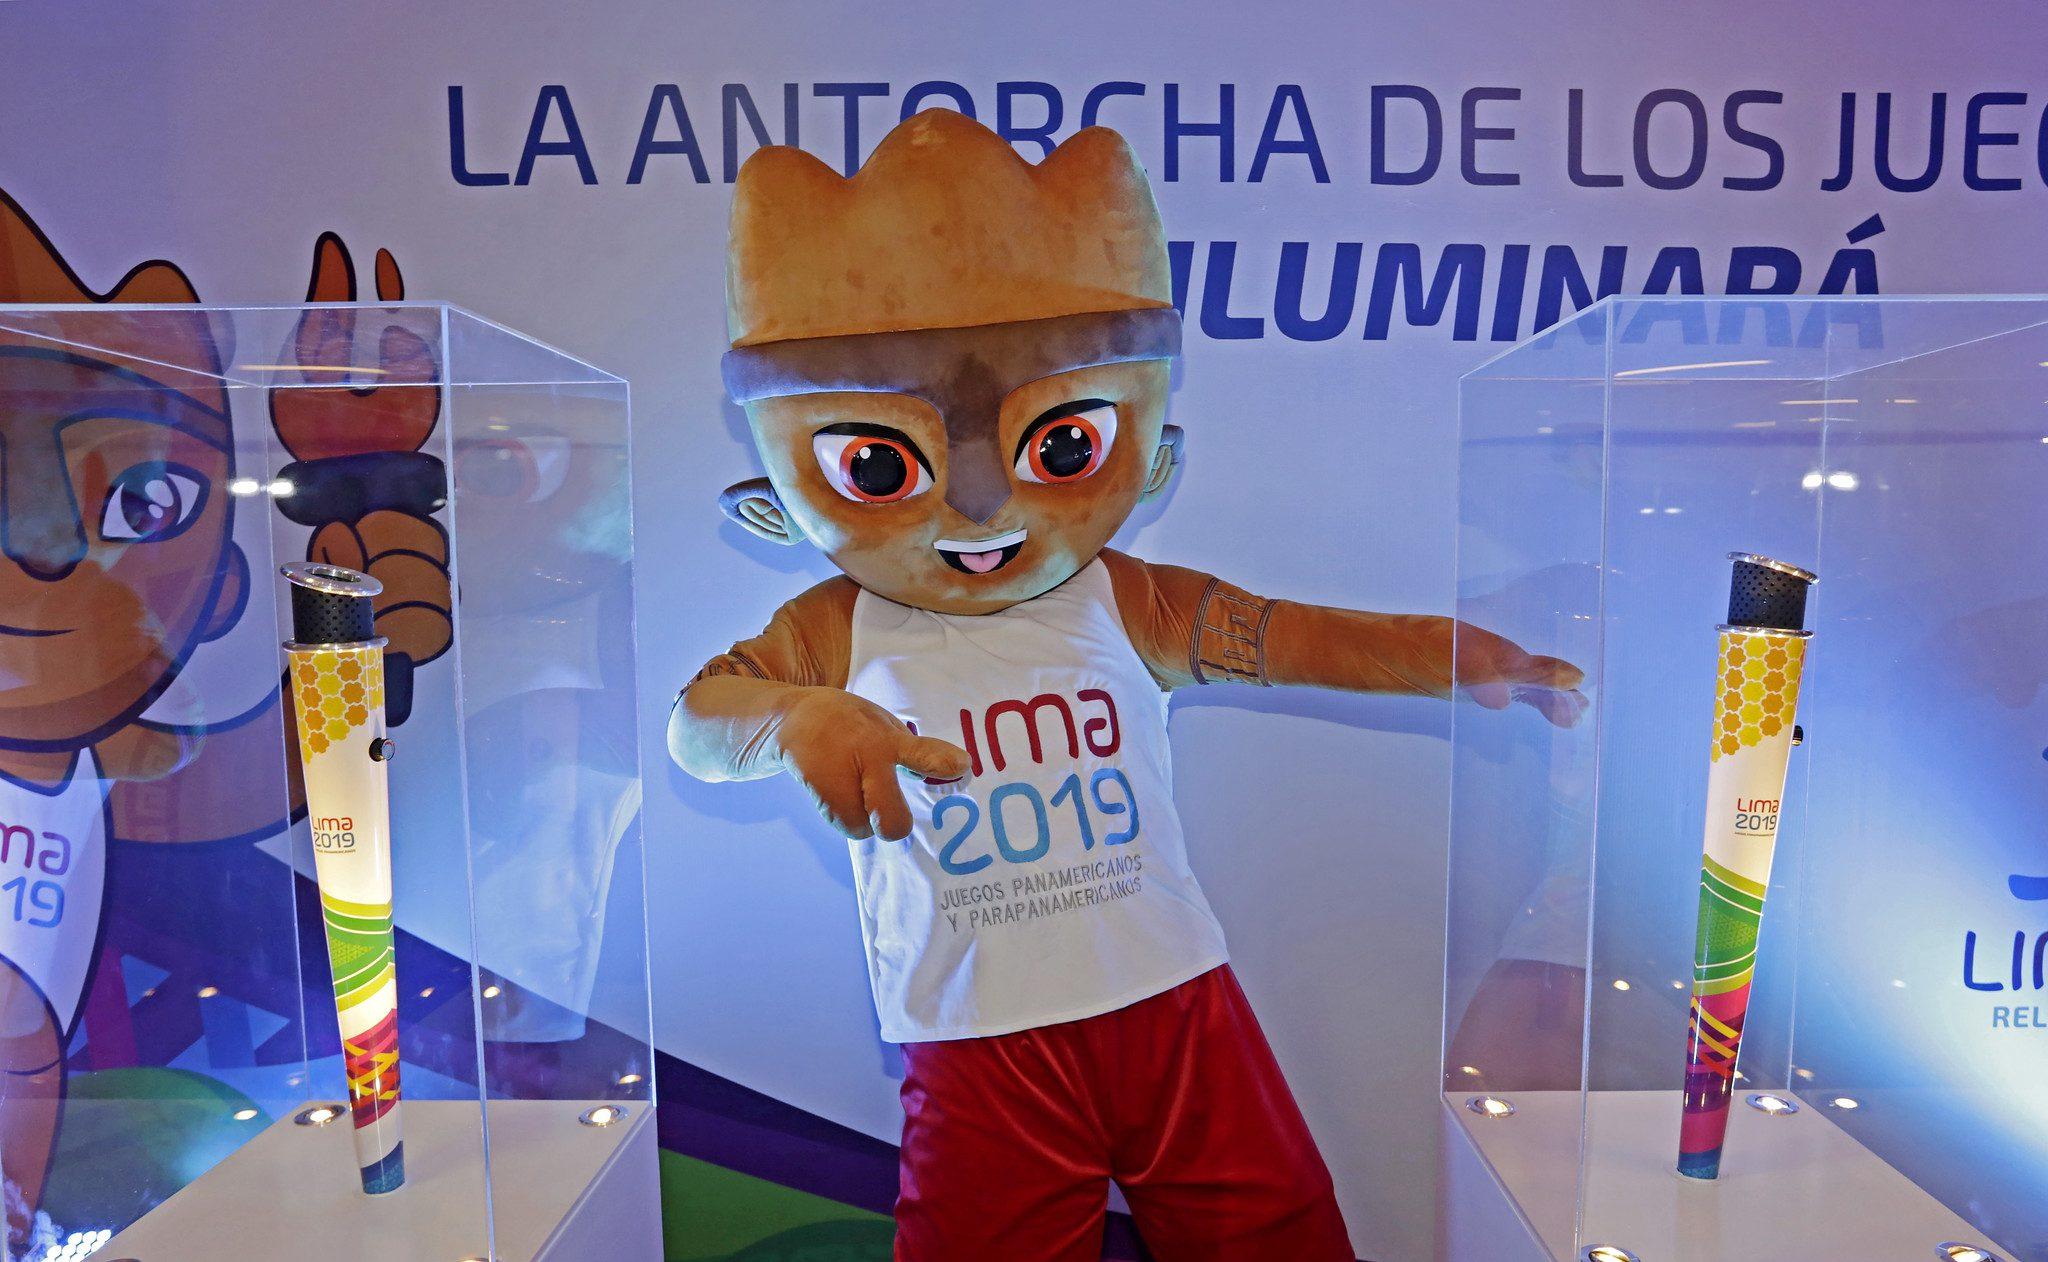 Lima 2019 presentó la antorcha parapanamericana